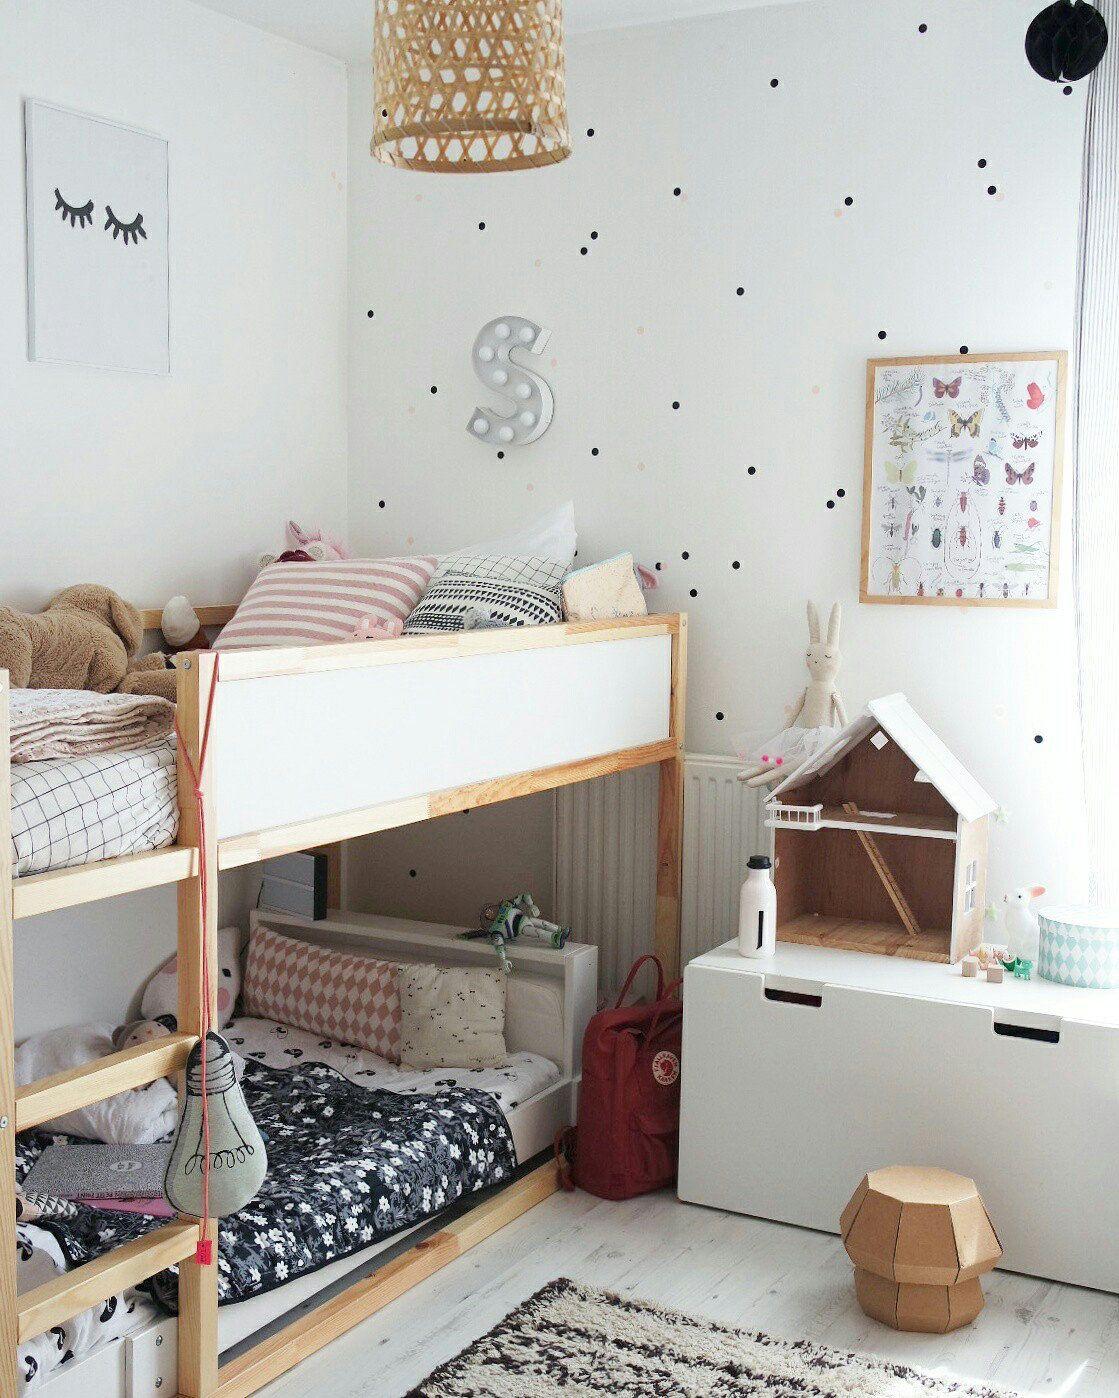 Light, Modern And Airy Sibling Kidsu0027 Room On The Handmade Childhoods Blog  By Fleur